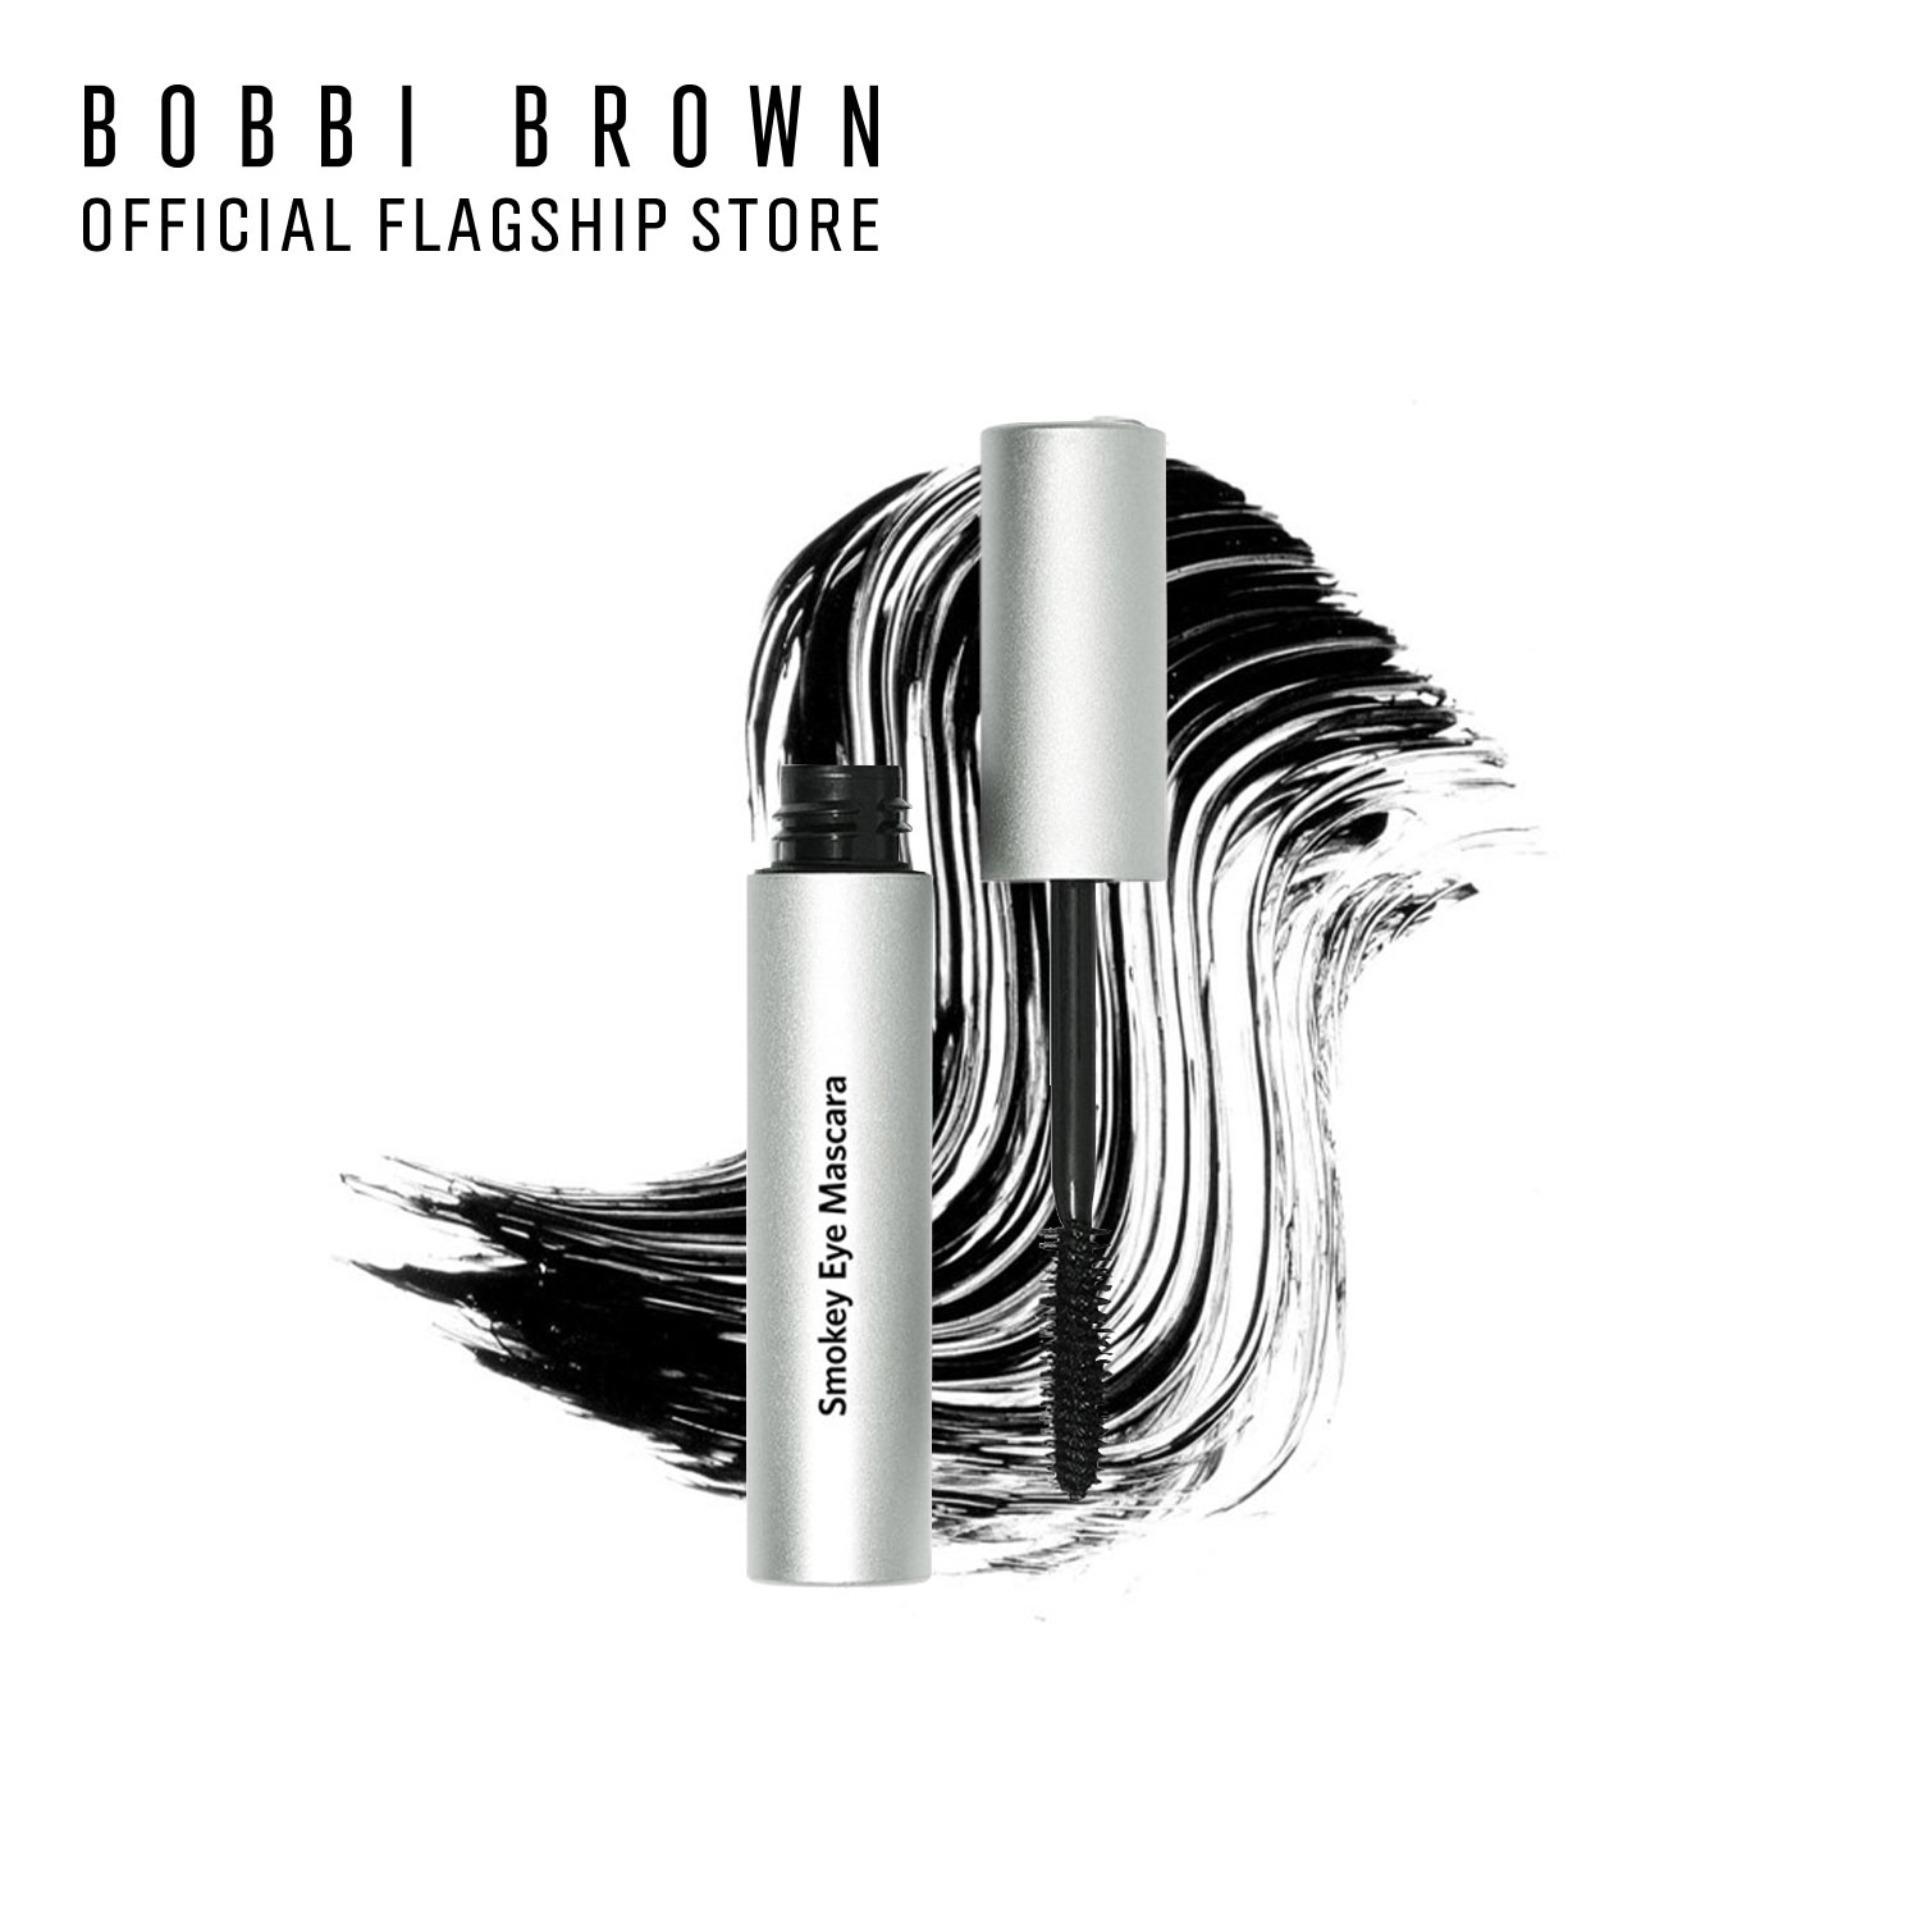 c244f9beb4f Latest Bobbi Brown Mascaras Products | Enjoy Huge Discounts | Lazada SG